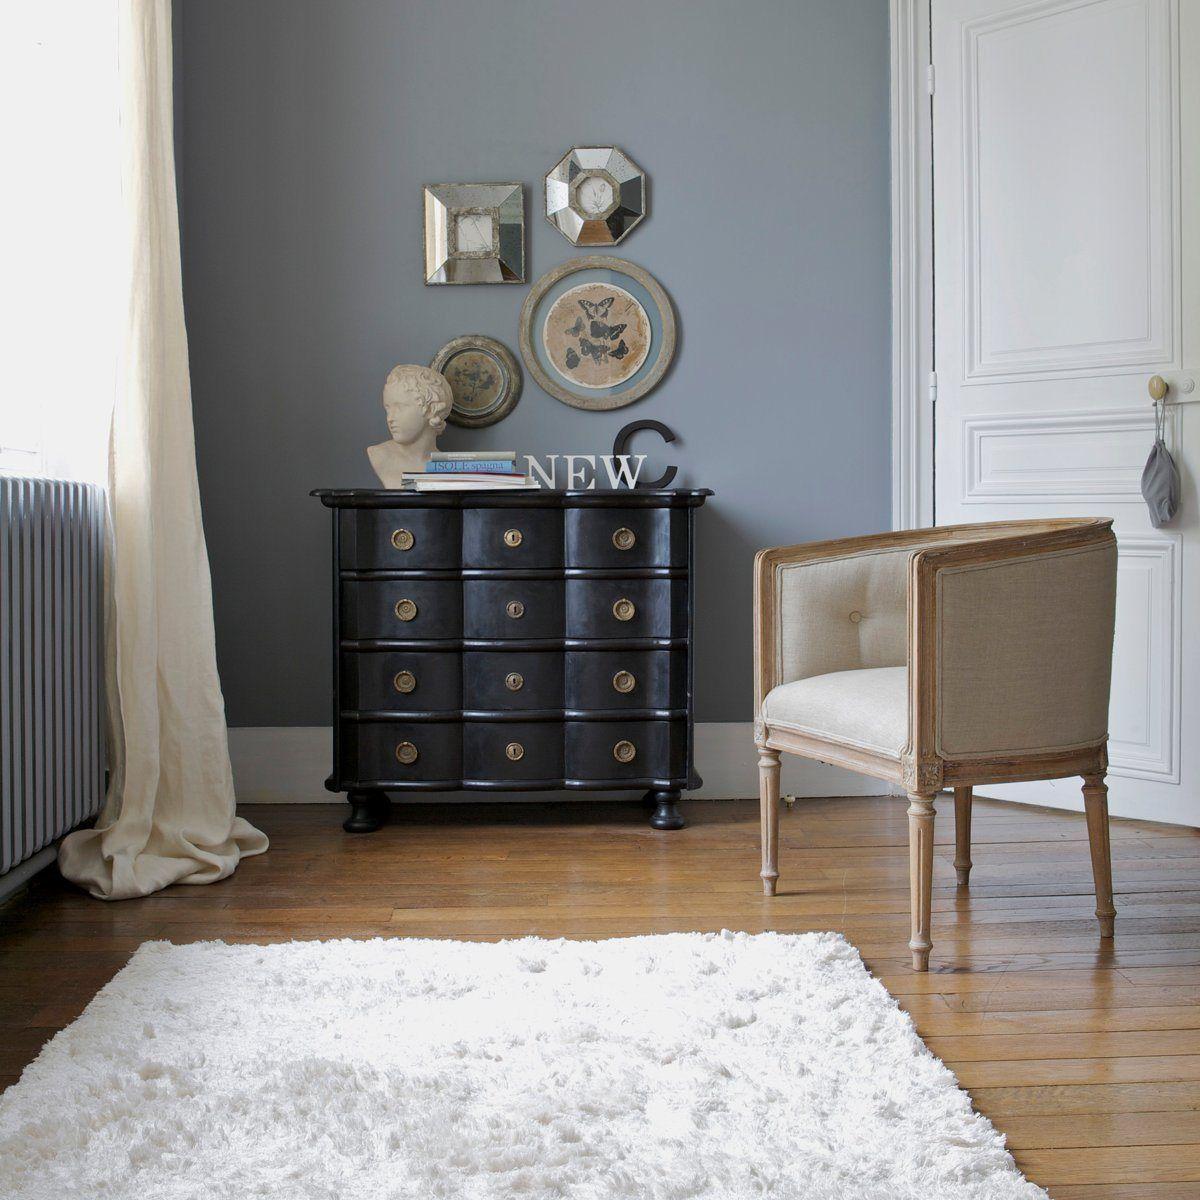 commode arbal te pens e am pm dream home pinterest. Black Bedroom Furniture Sets. Home Design Ideas